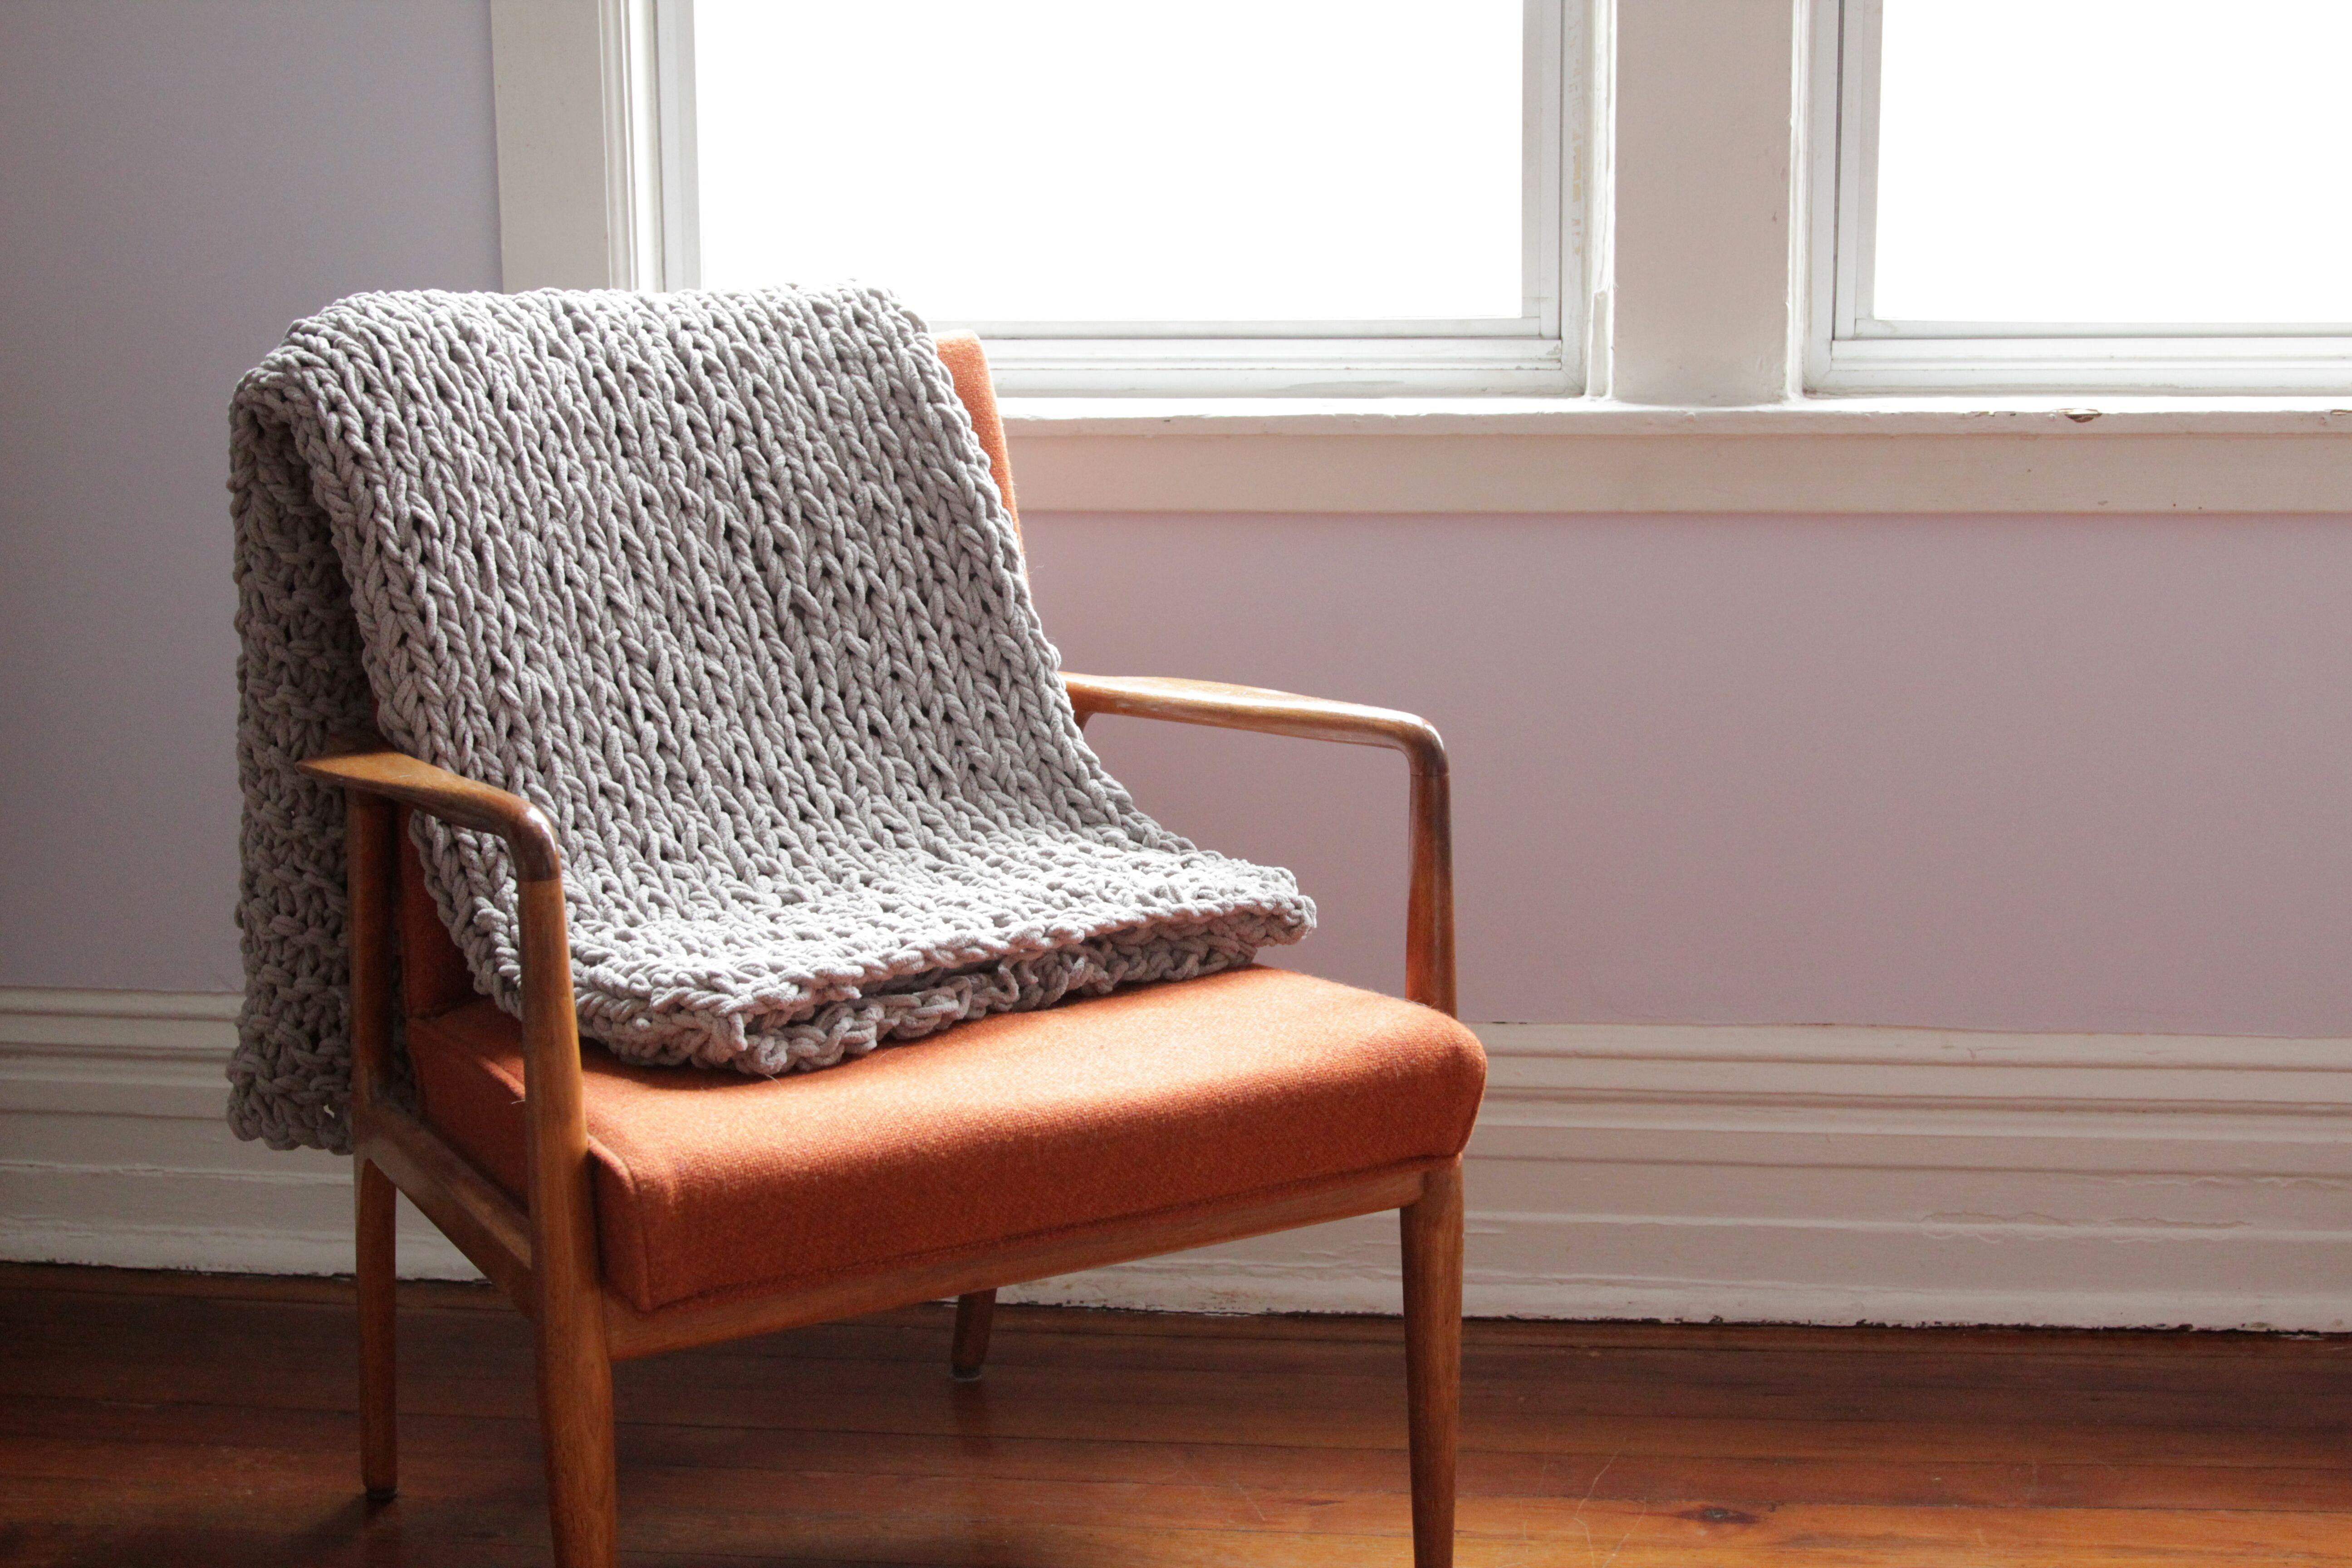 23 Easy Knitting Patterns for Beginners